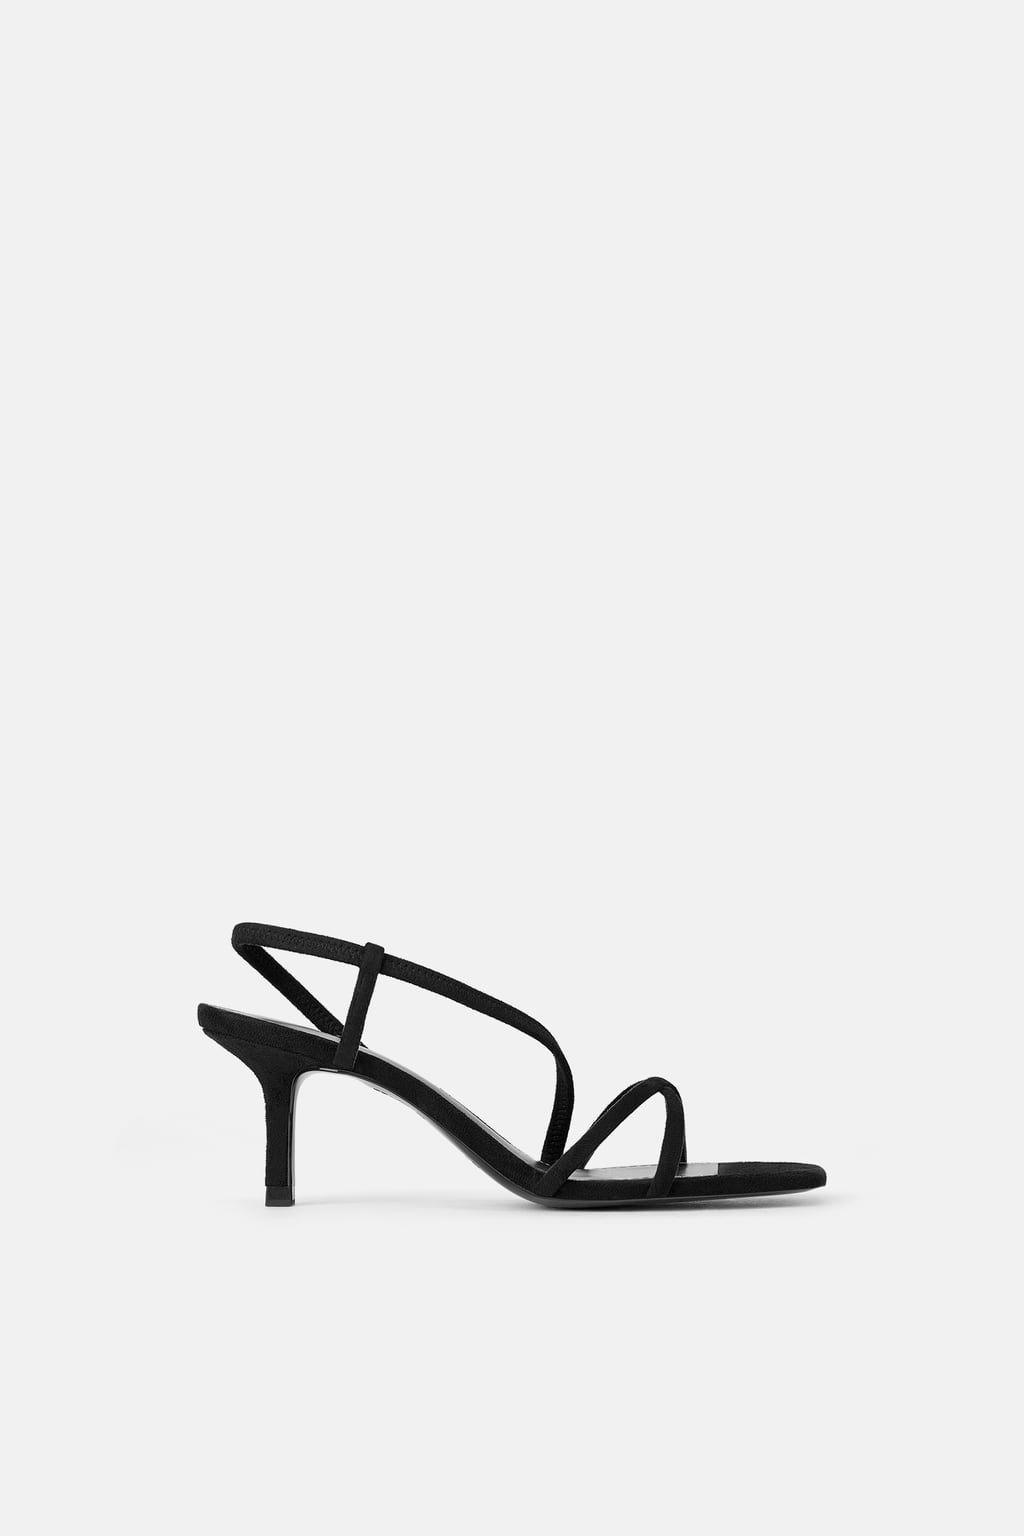 Mid heel sandals, Black strappy sandals